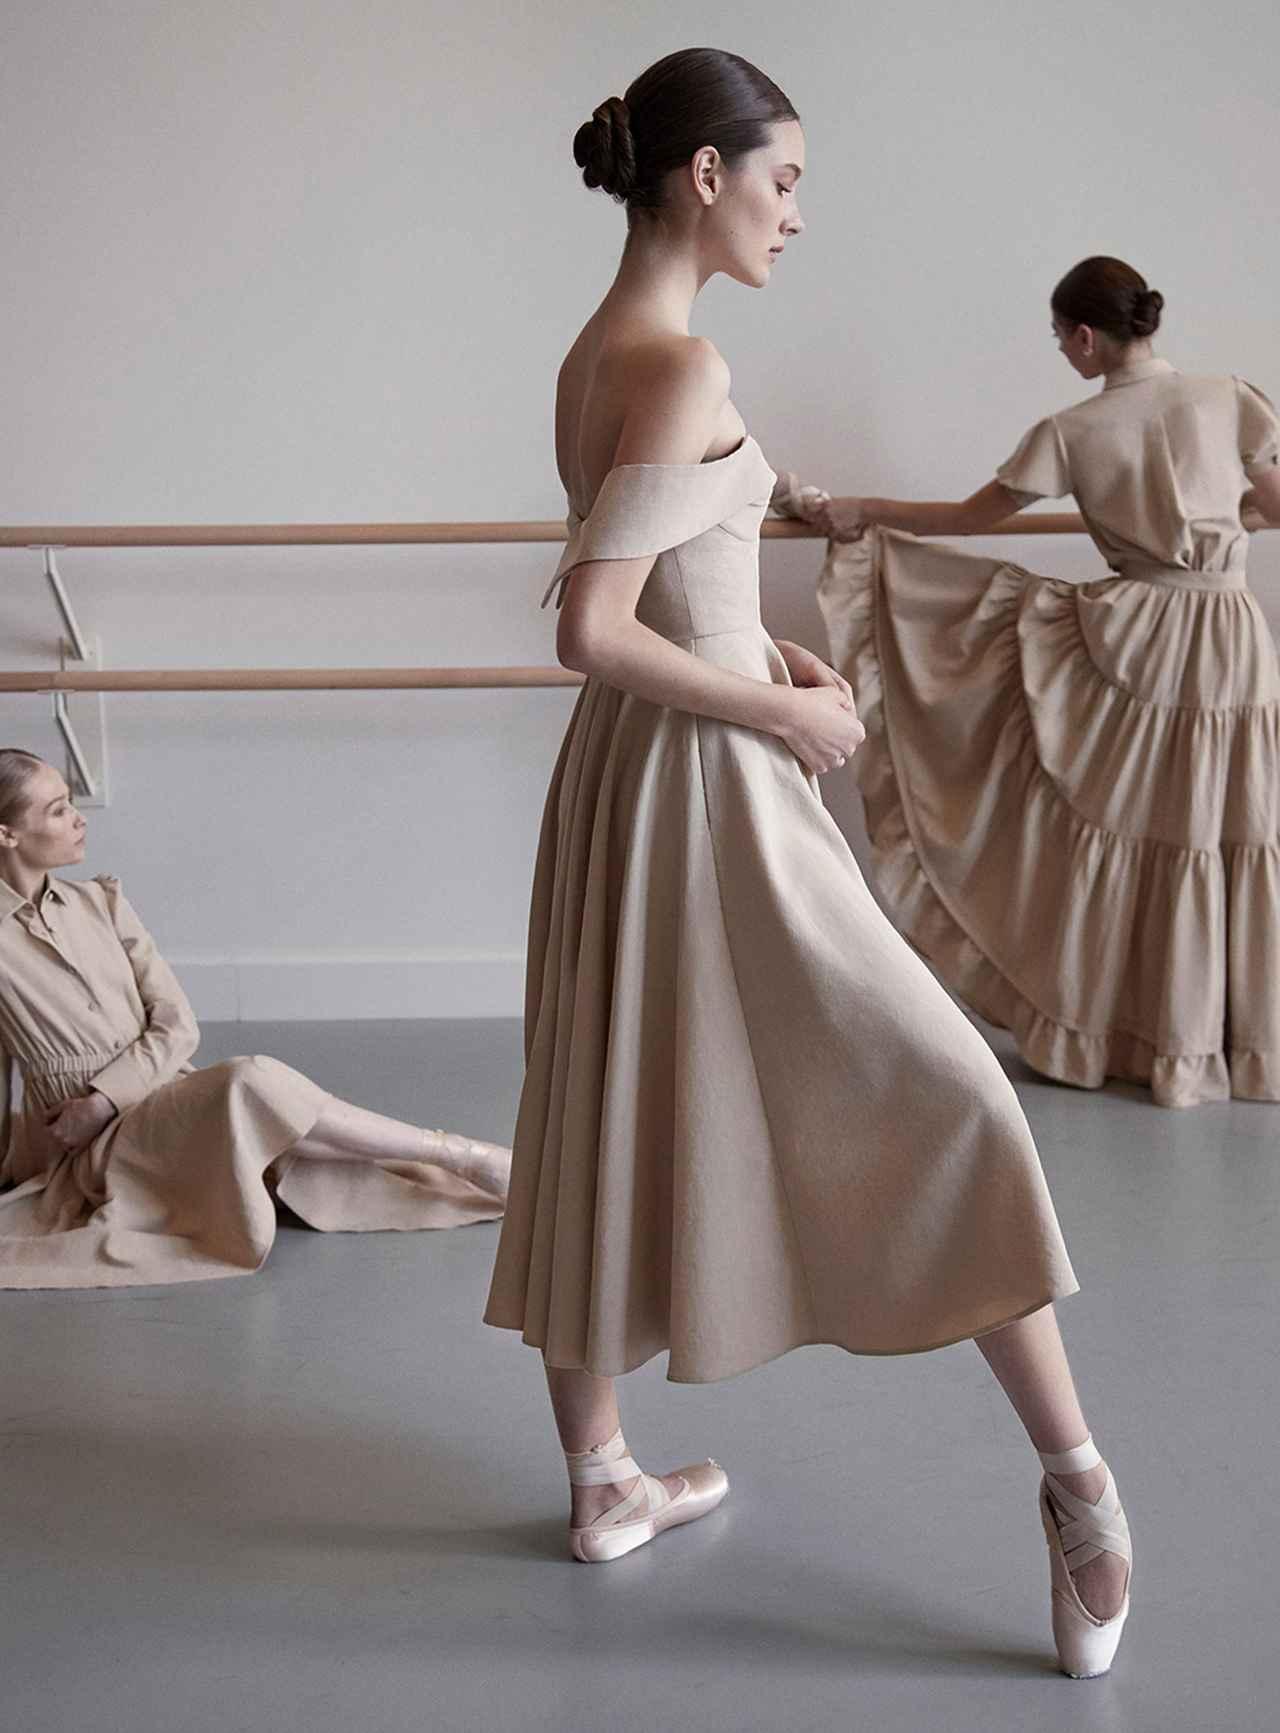 Images : 3番目の画像 - 「ドレス自由自在<Vol.2> 新しい才能が花盛り。 ニュー・ドレス時代到来」のアルバム - T JAPAN:The New York Times Style Magazine 公式サイト